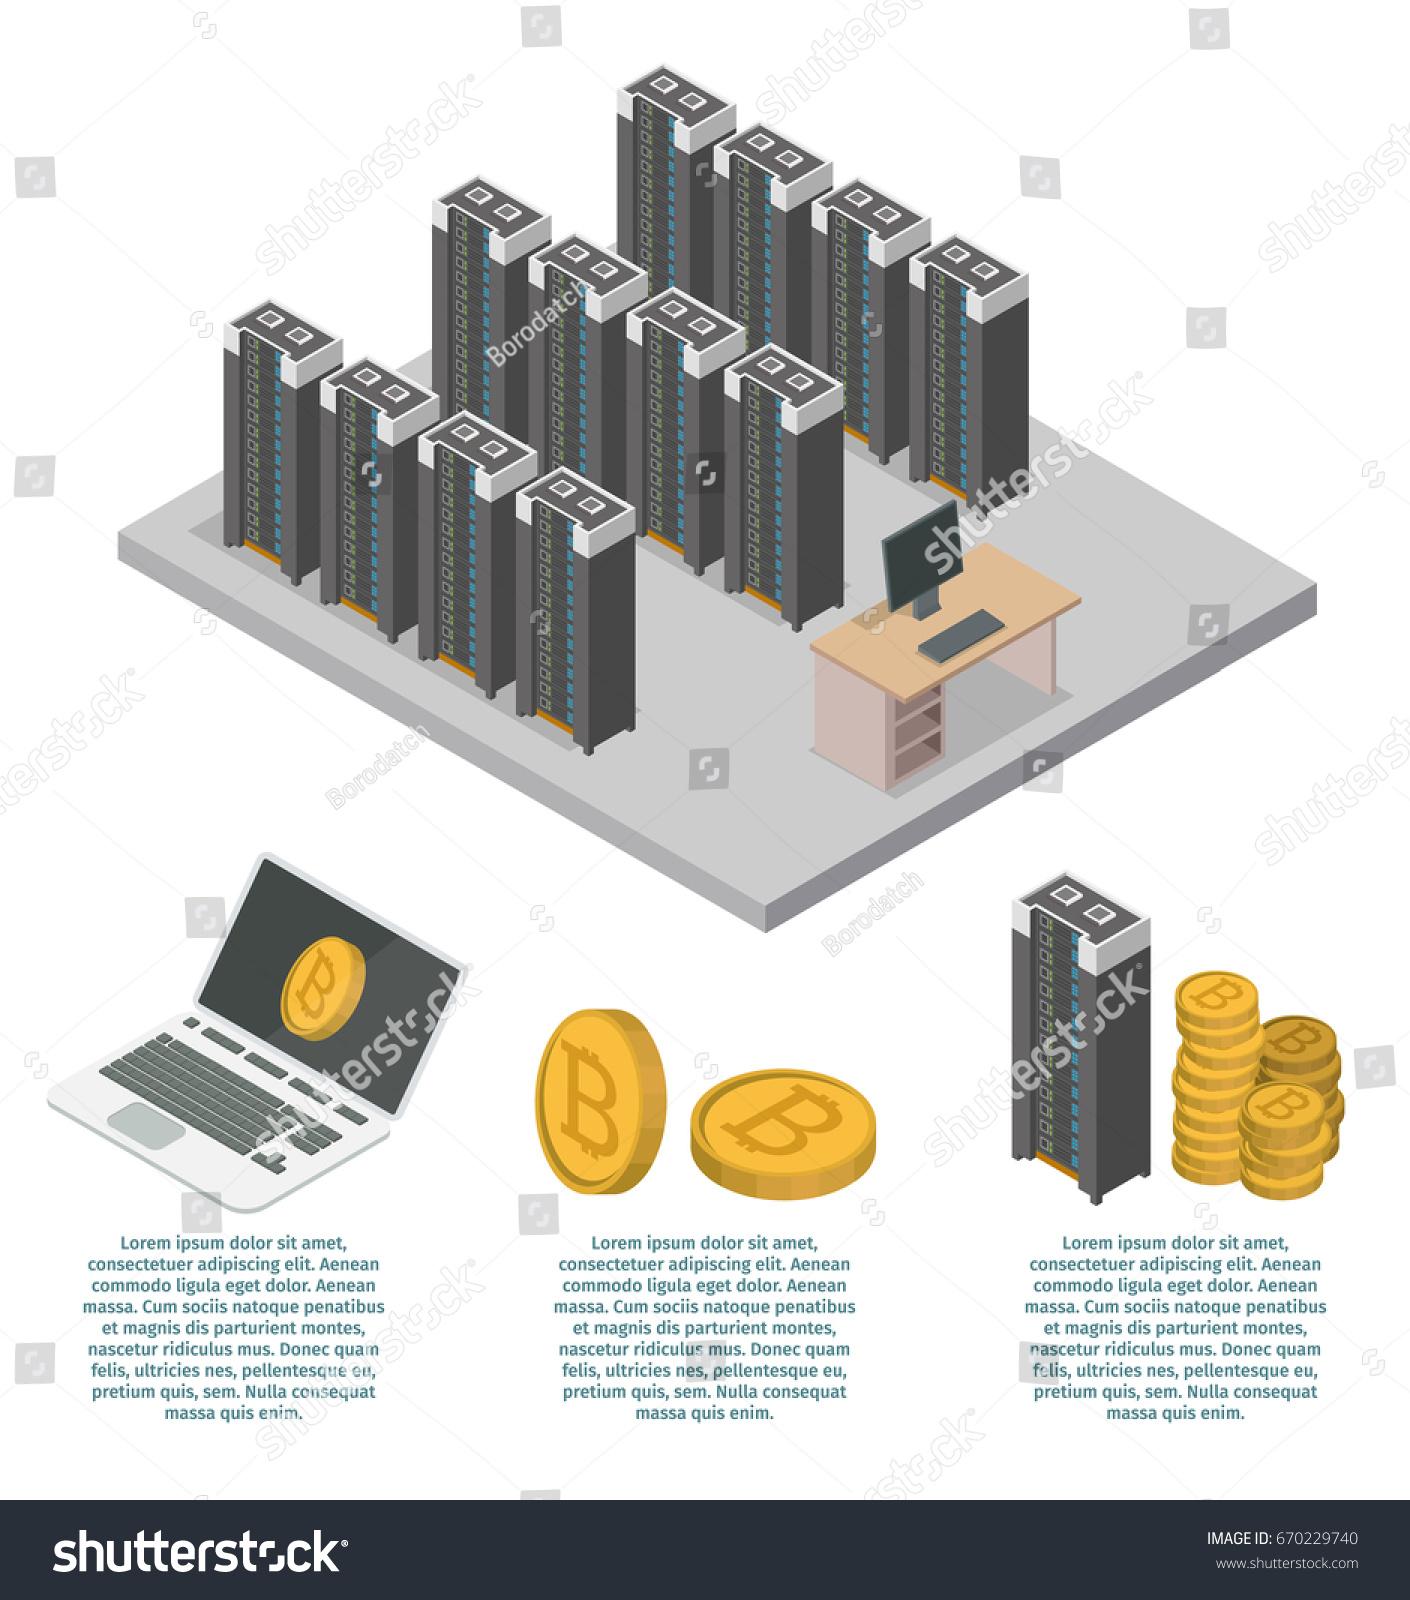 Bitcoin Mining Farm Isometric Concept 3d Infographic